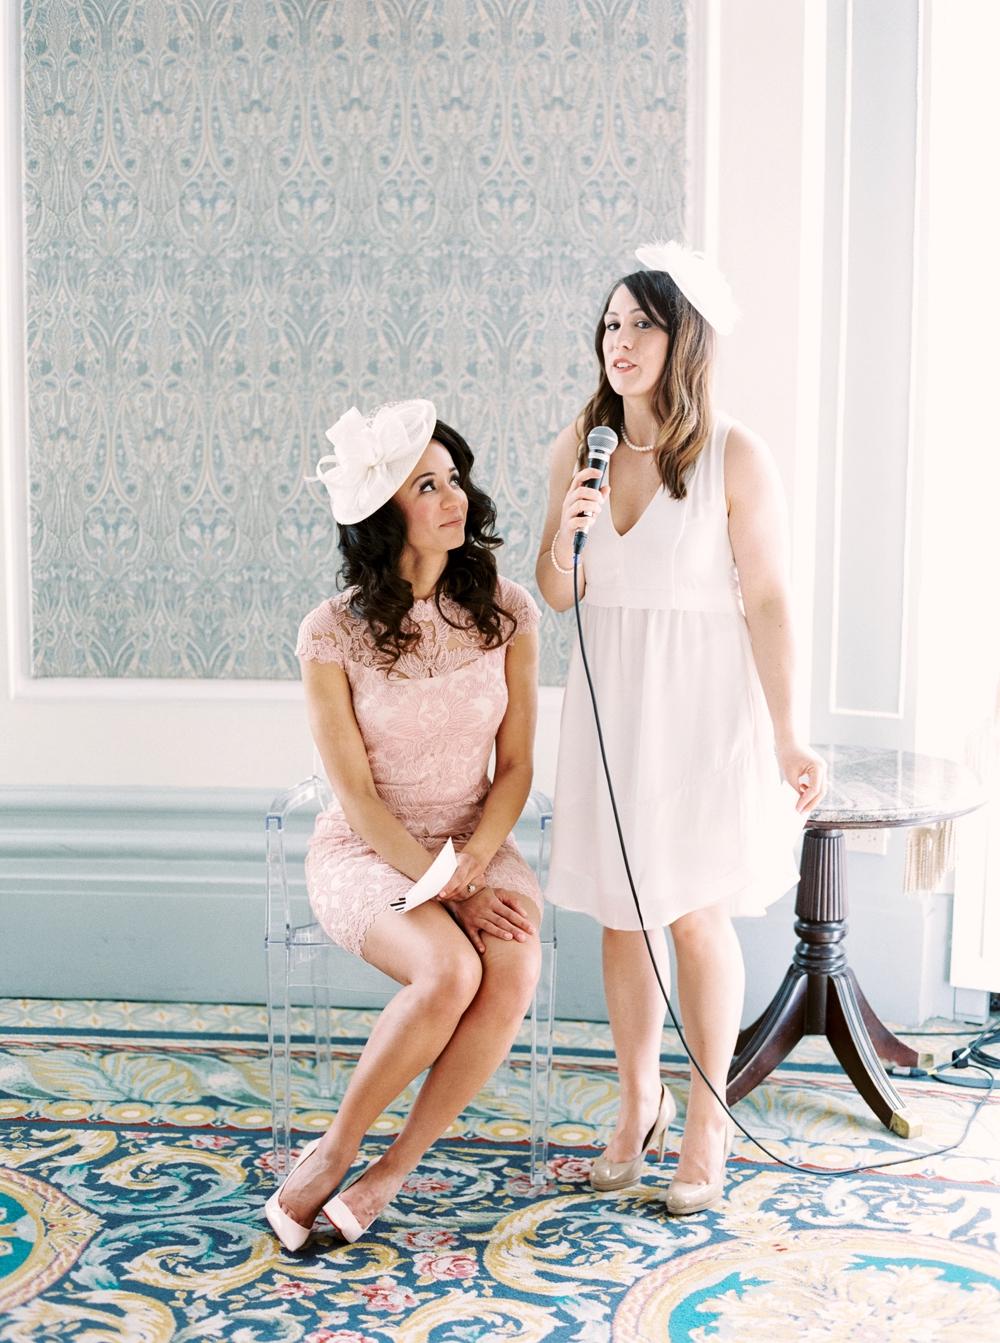 Bridal Shower | Calgary Wedding Photographers | Edmonton Bridal Showers Photography | Chanel Themed Party | Fairmont Hotel Macdonald